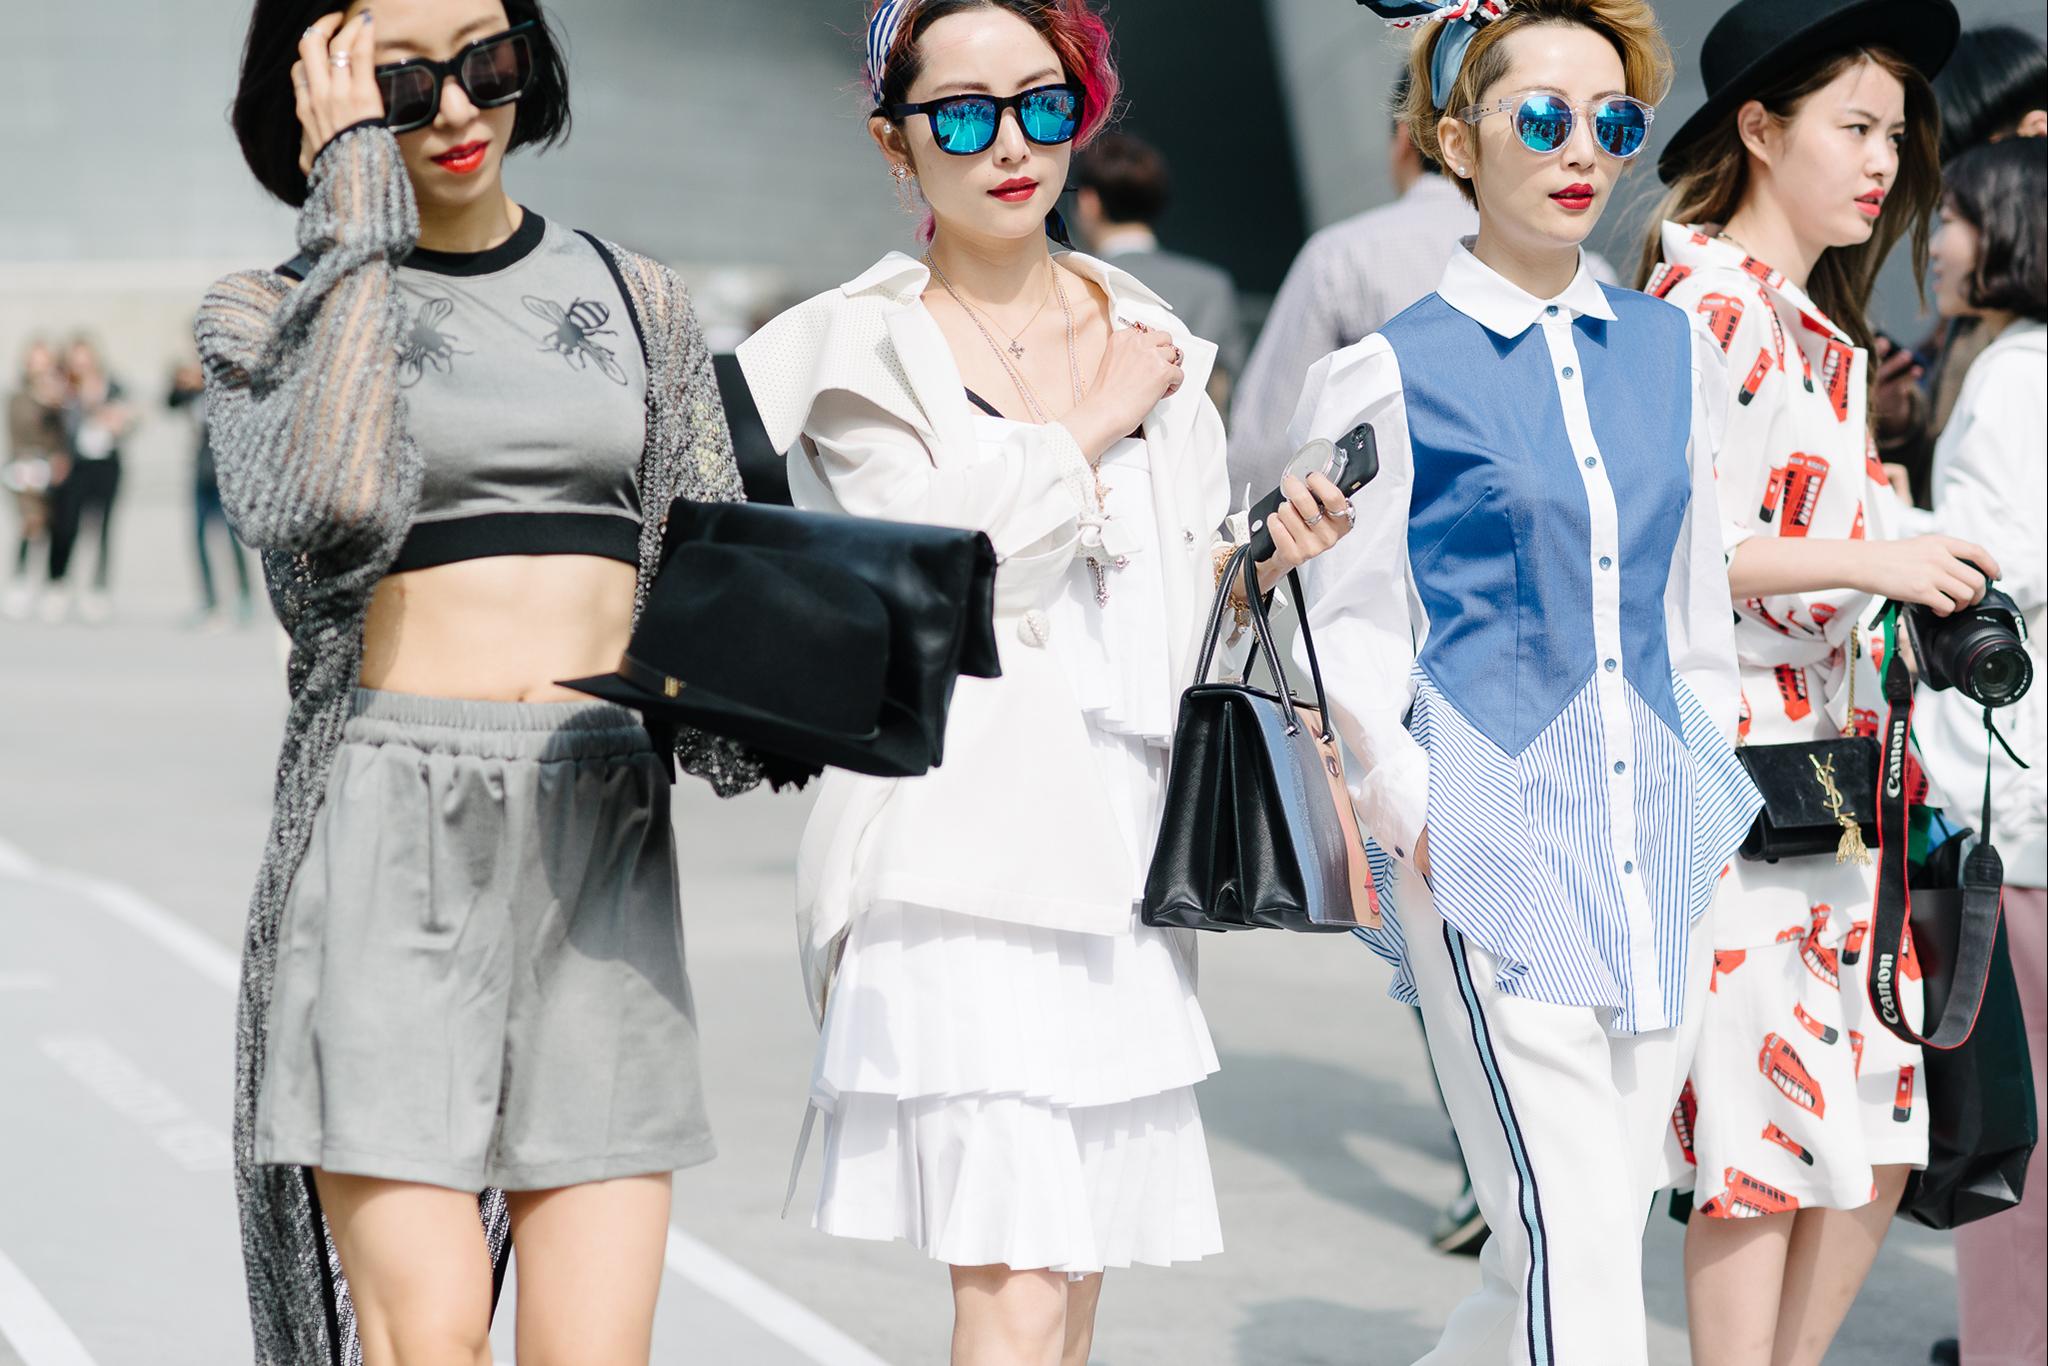 ba fashionista mặc đồ theo phong cách monochorme seoul fashion week 2